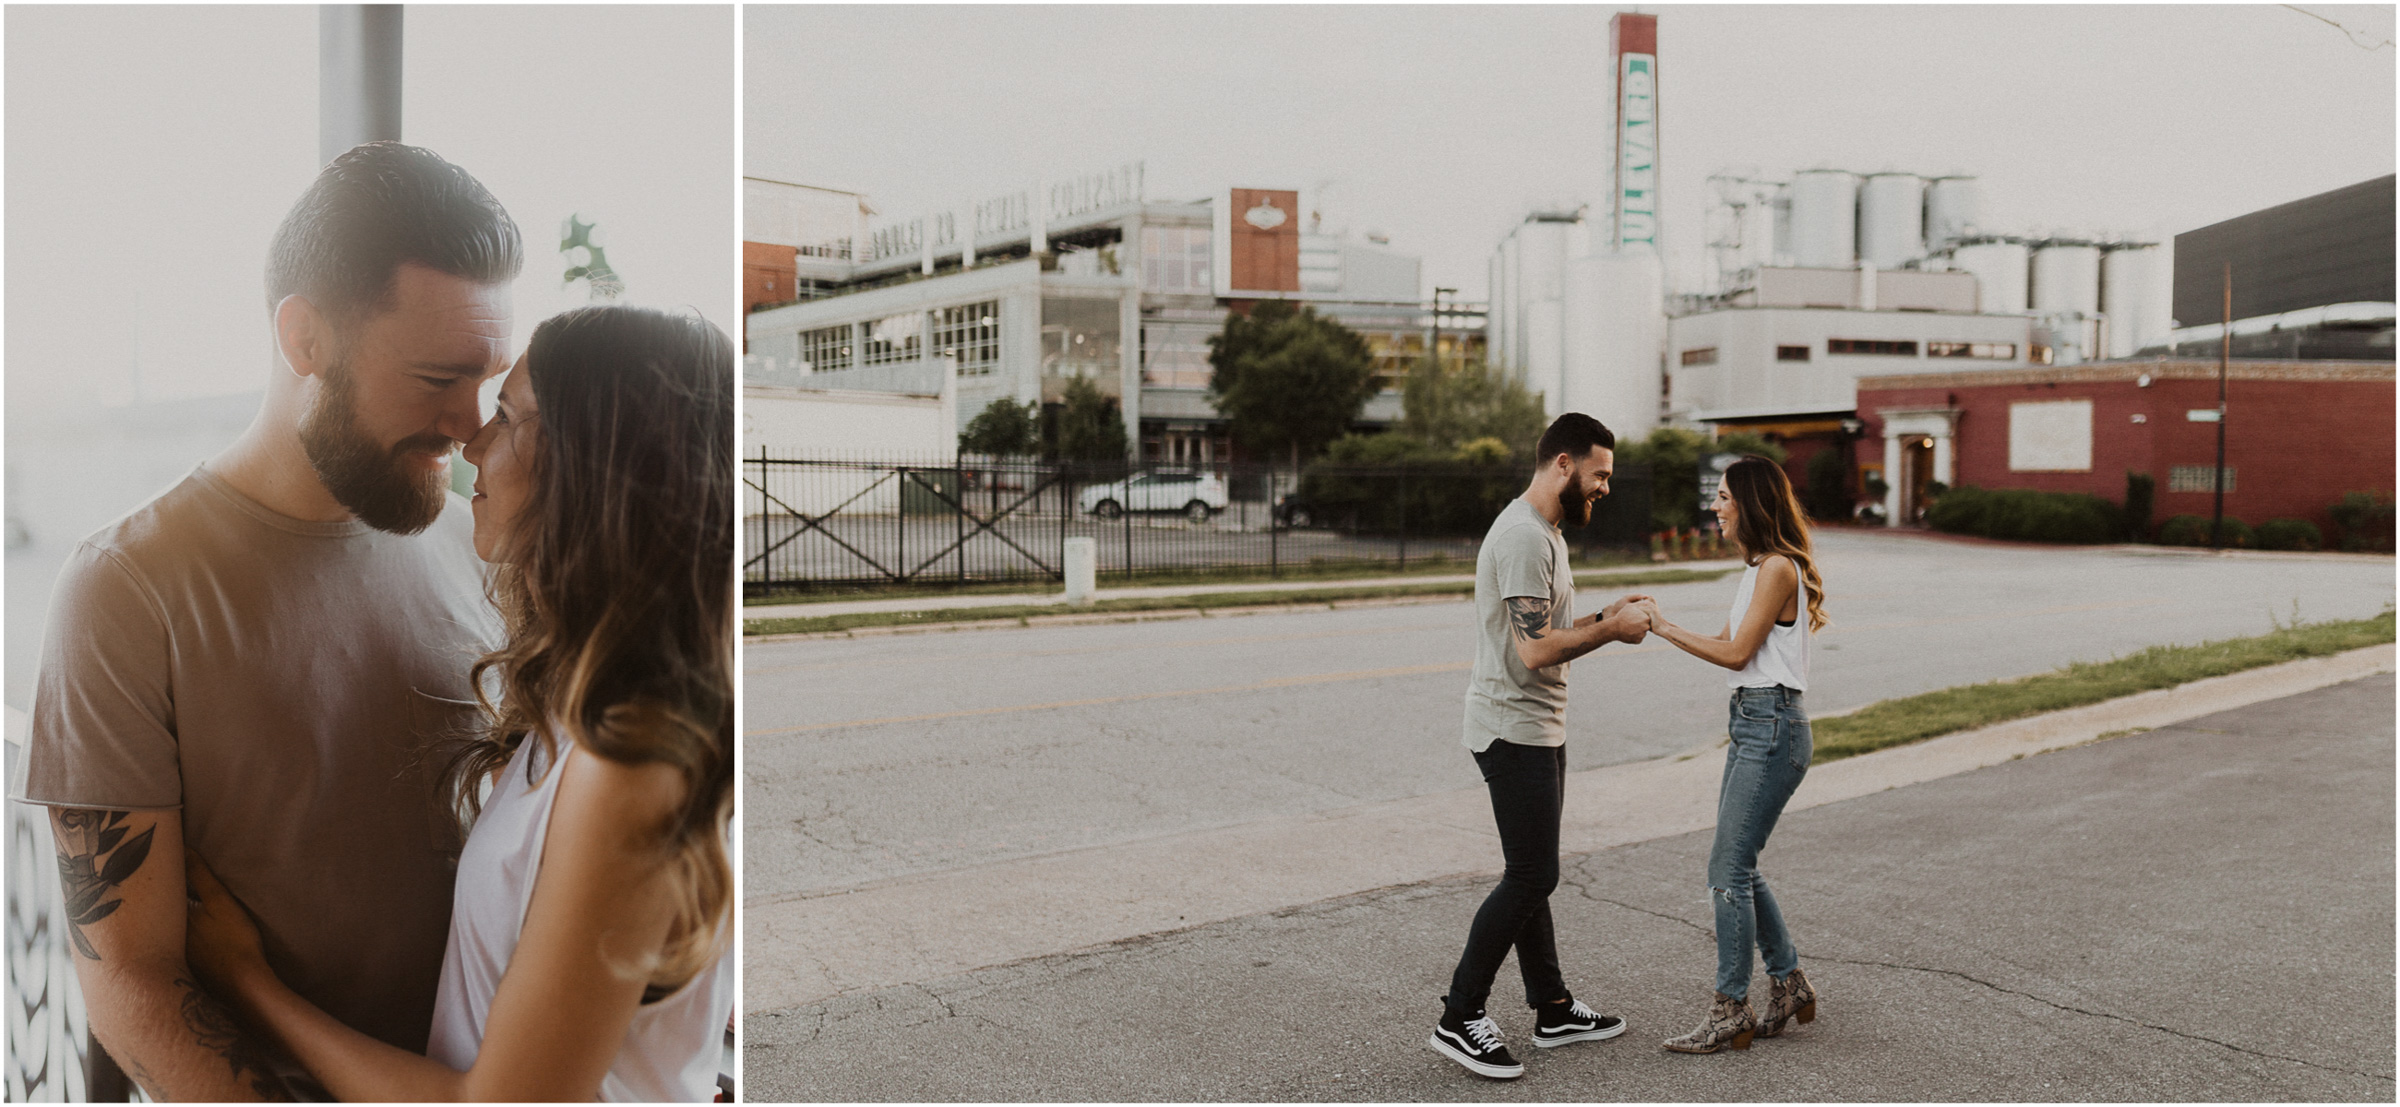 alyssa barletter photography downtown kansas city photos with couple and aussies austrailian shepards-5.jpg